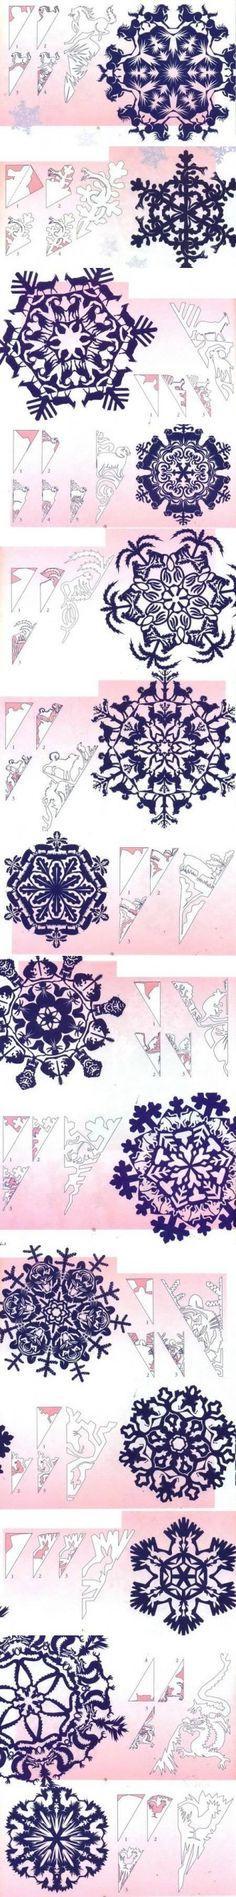 DIY Zodiac paper pattern